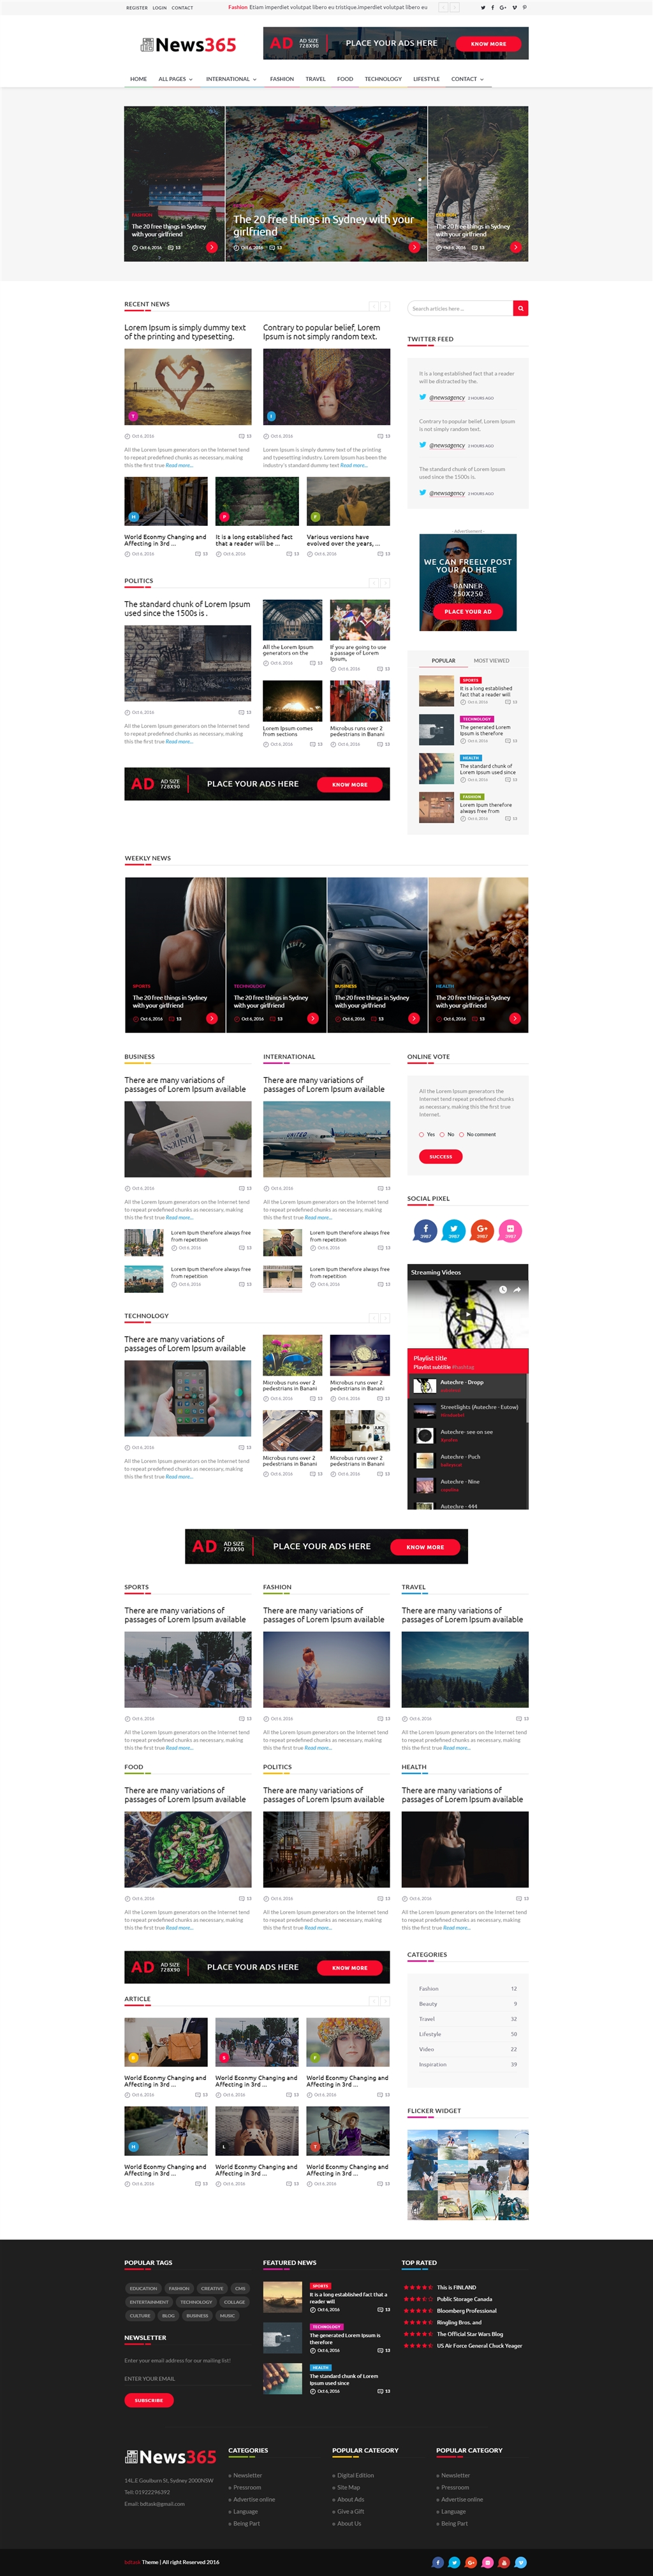 News365 - Newspaper Magazine Blog HTML Multipurpose Template with ...